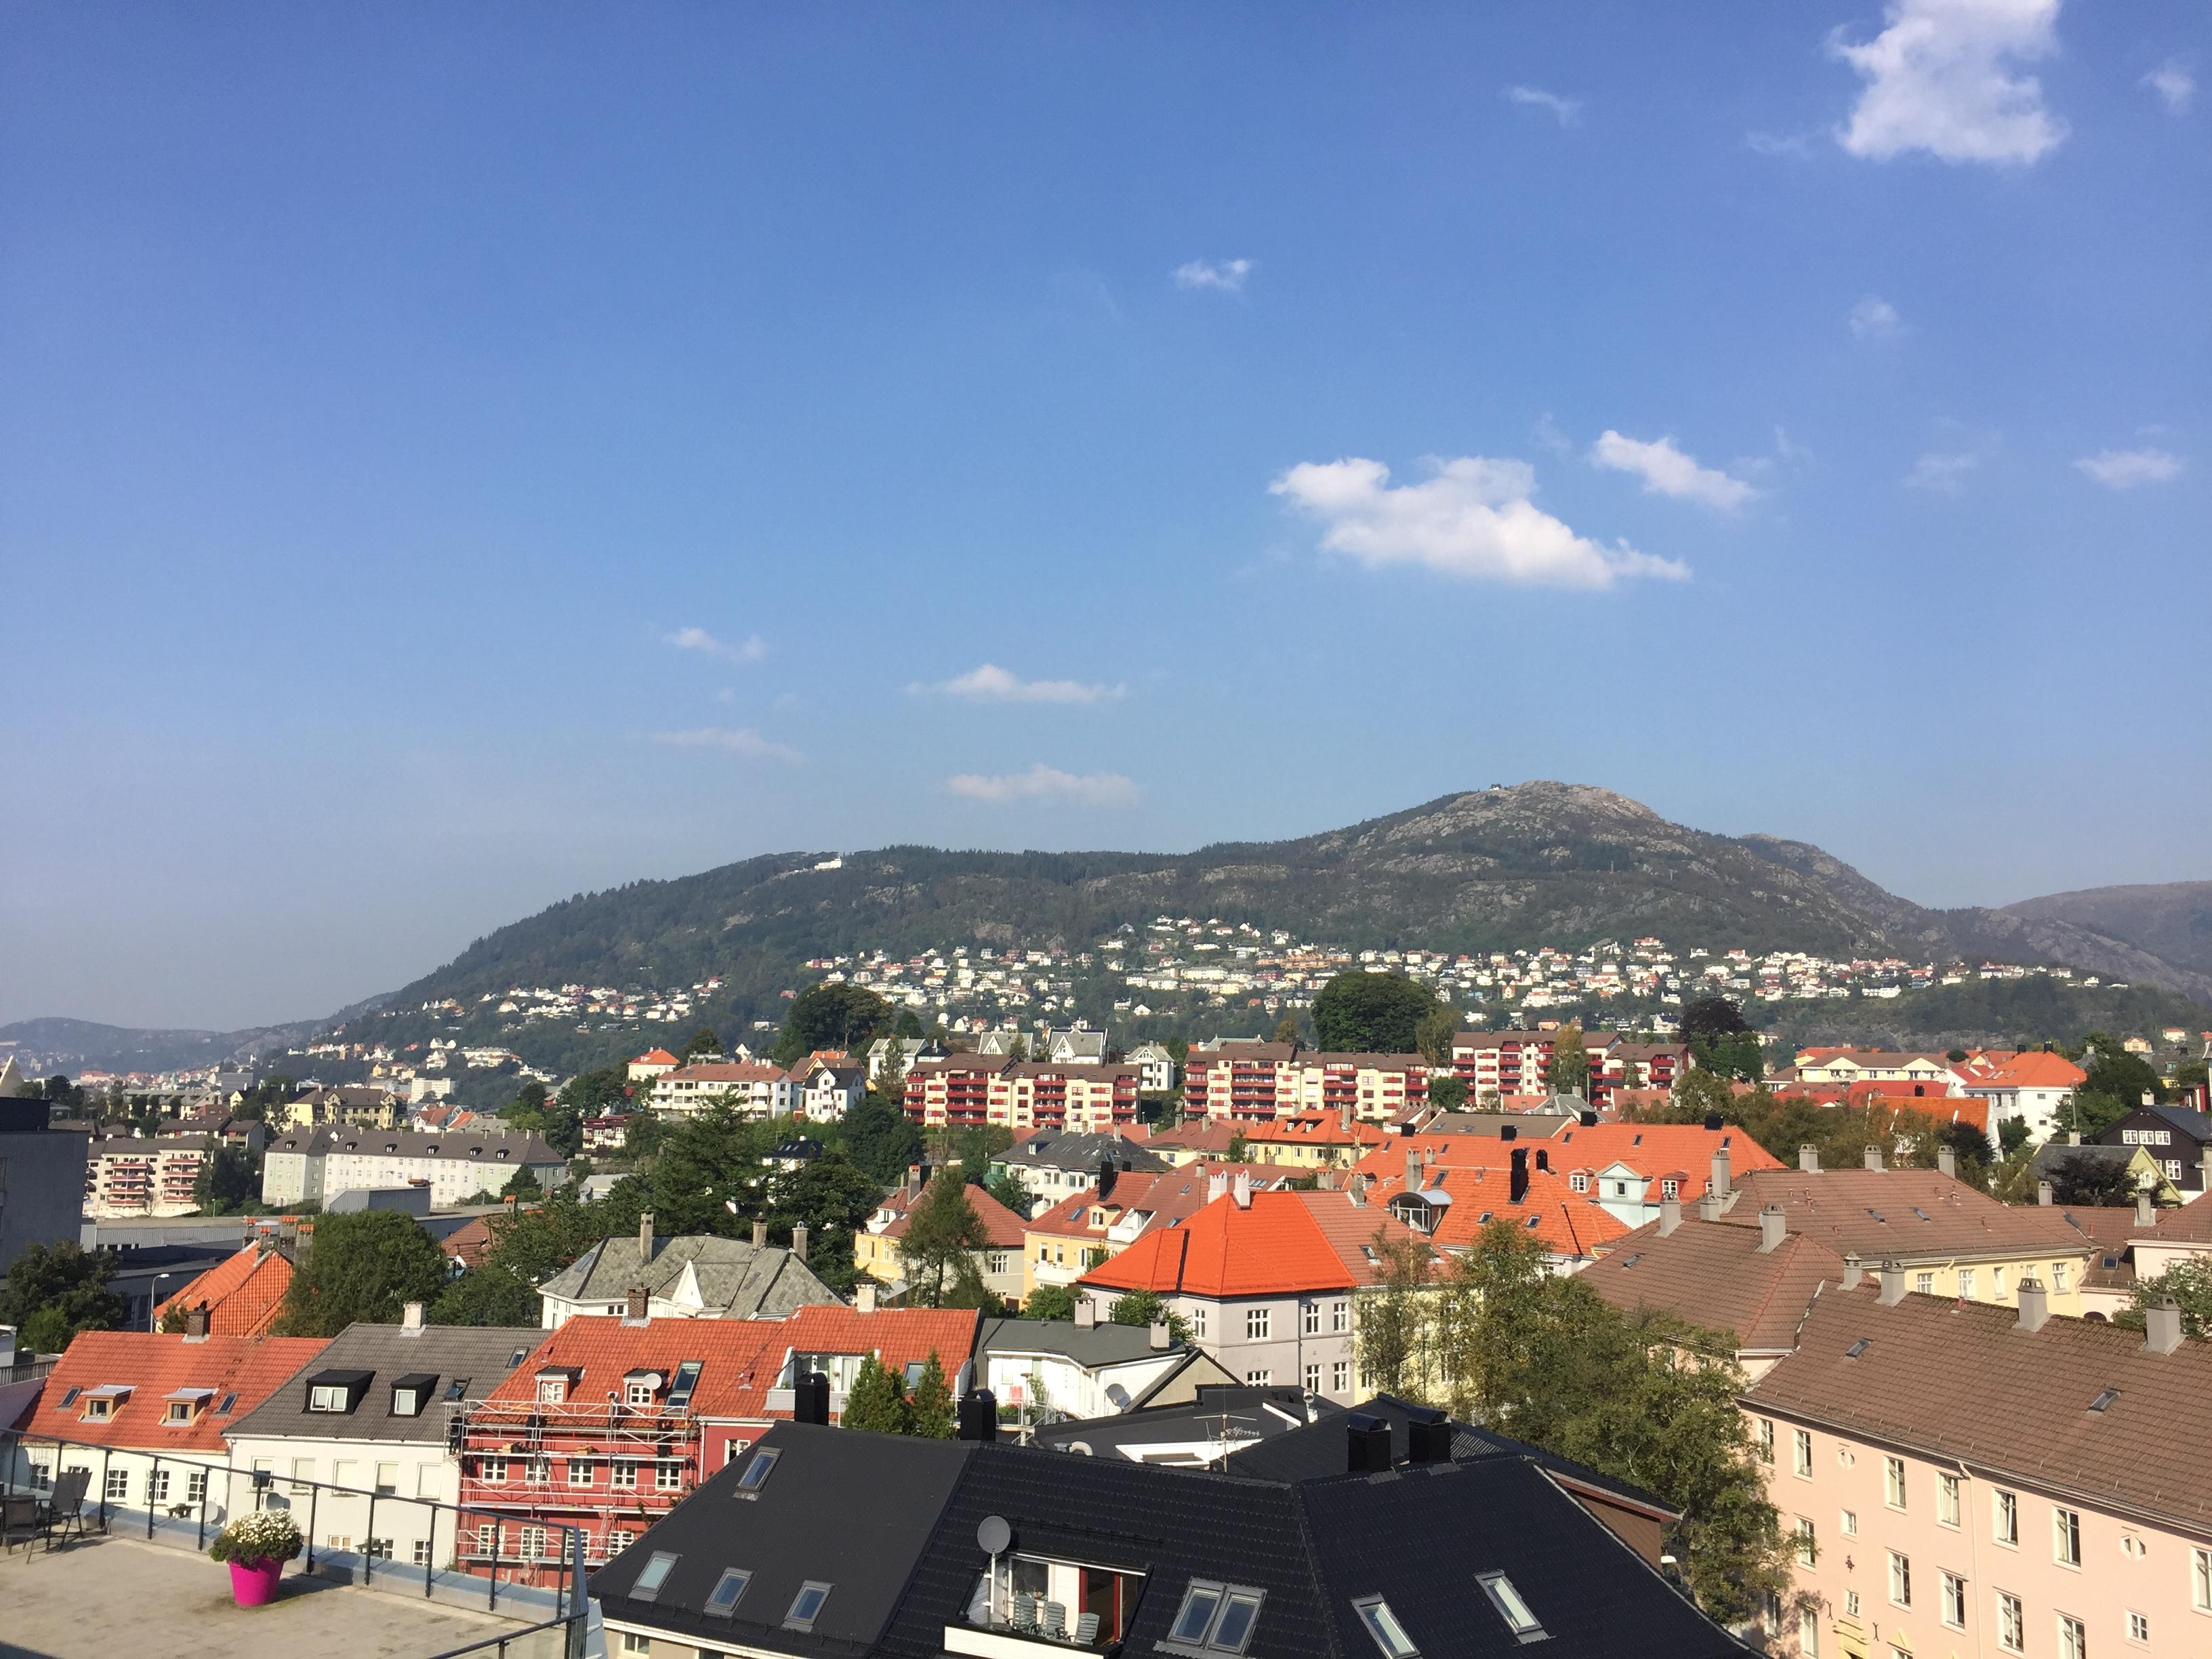 Innflytningsfest – Housewarming in Bergen